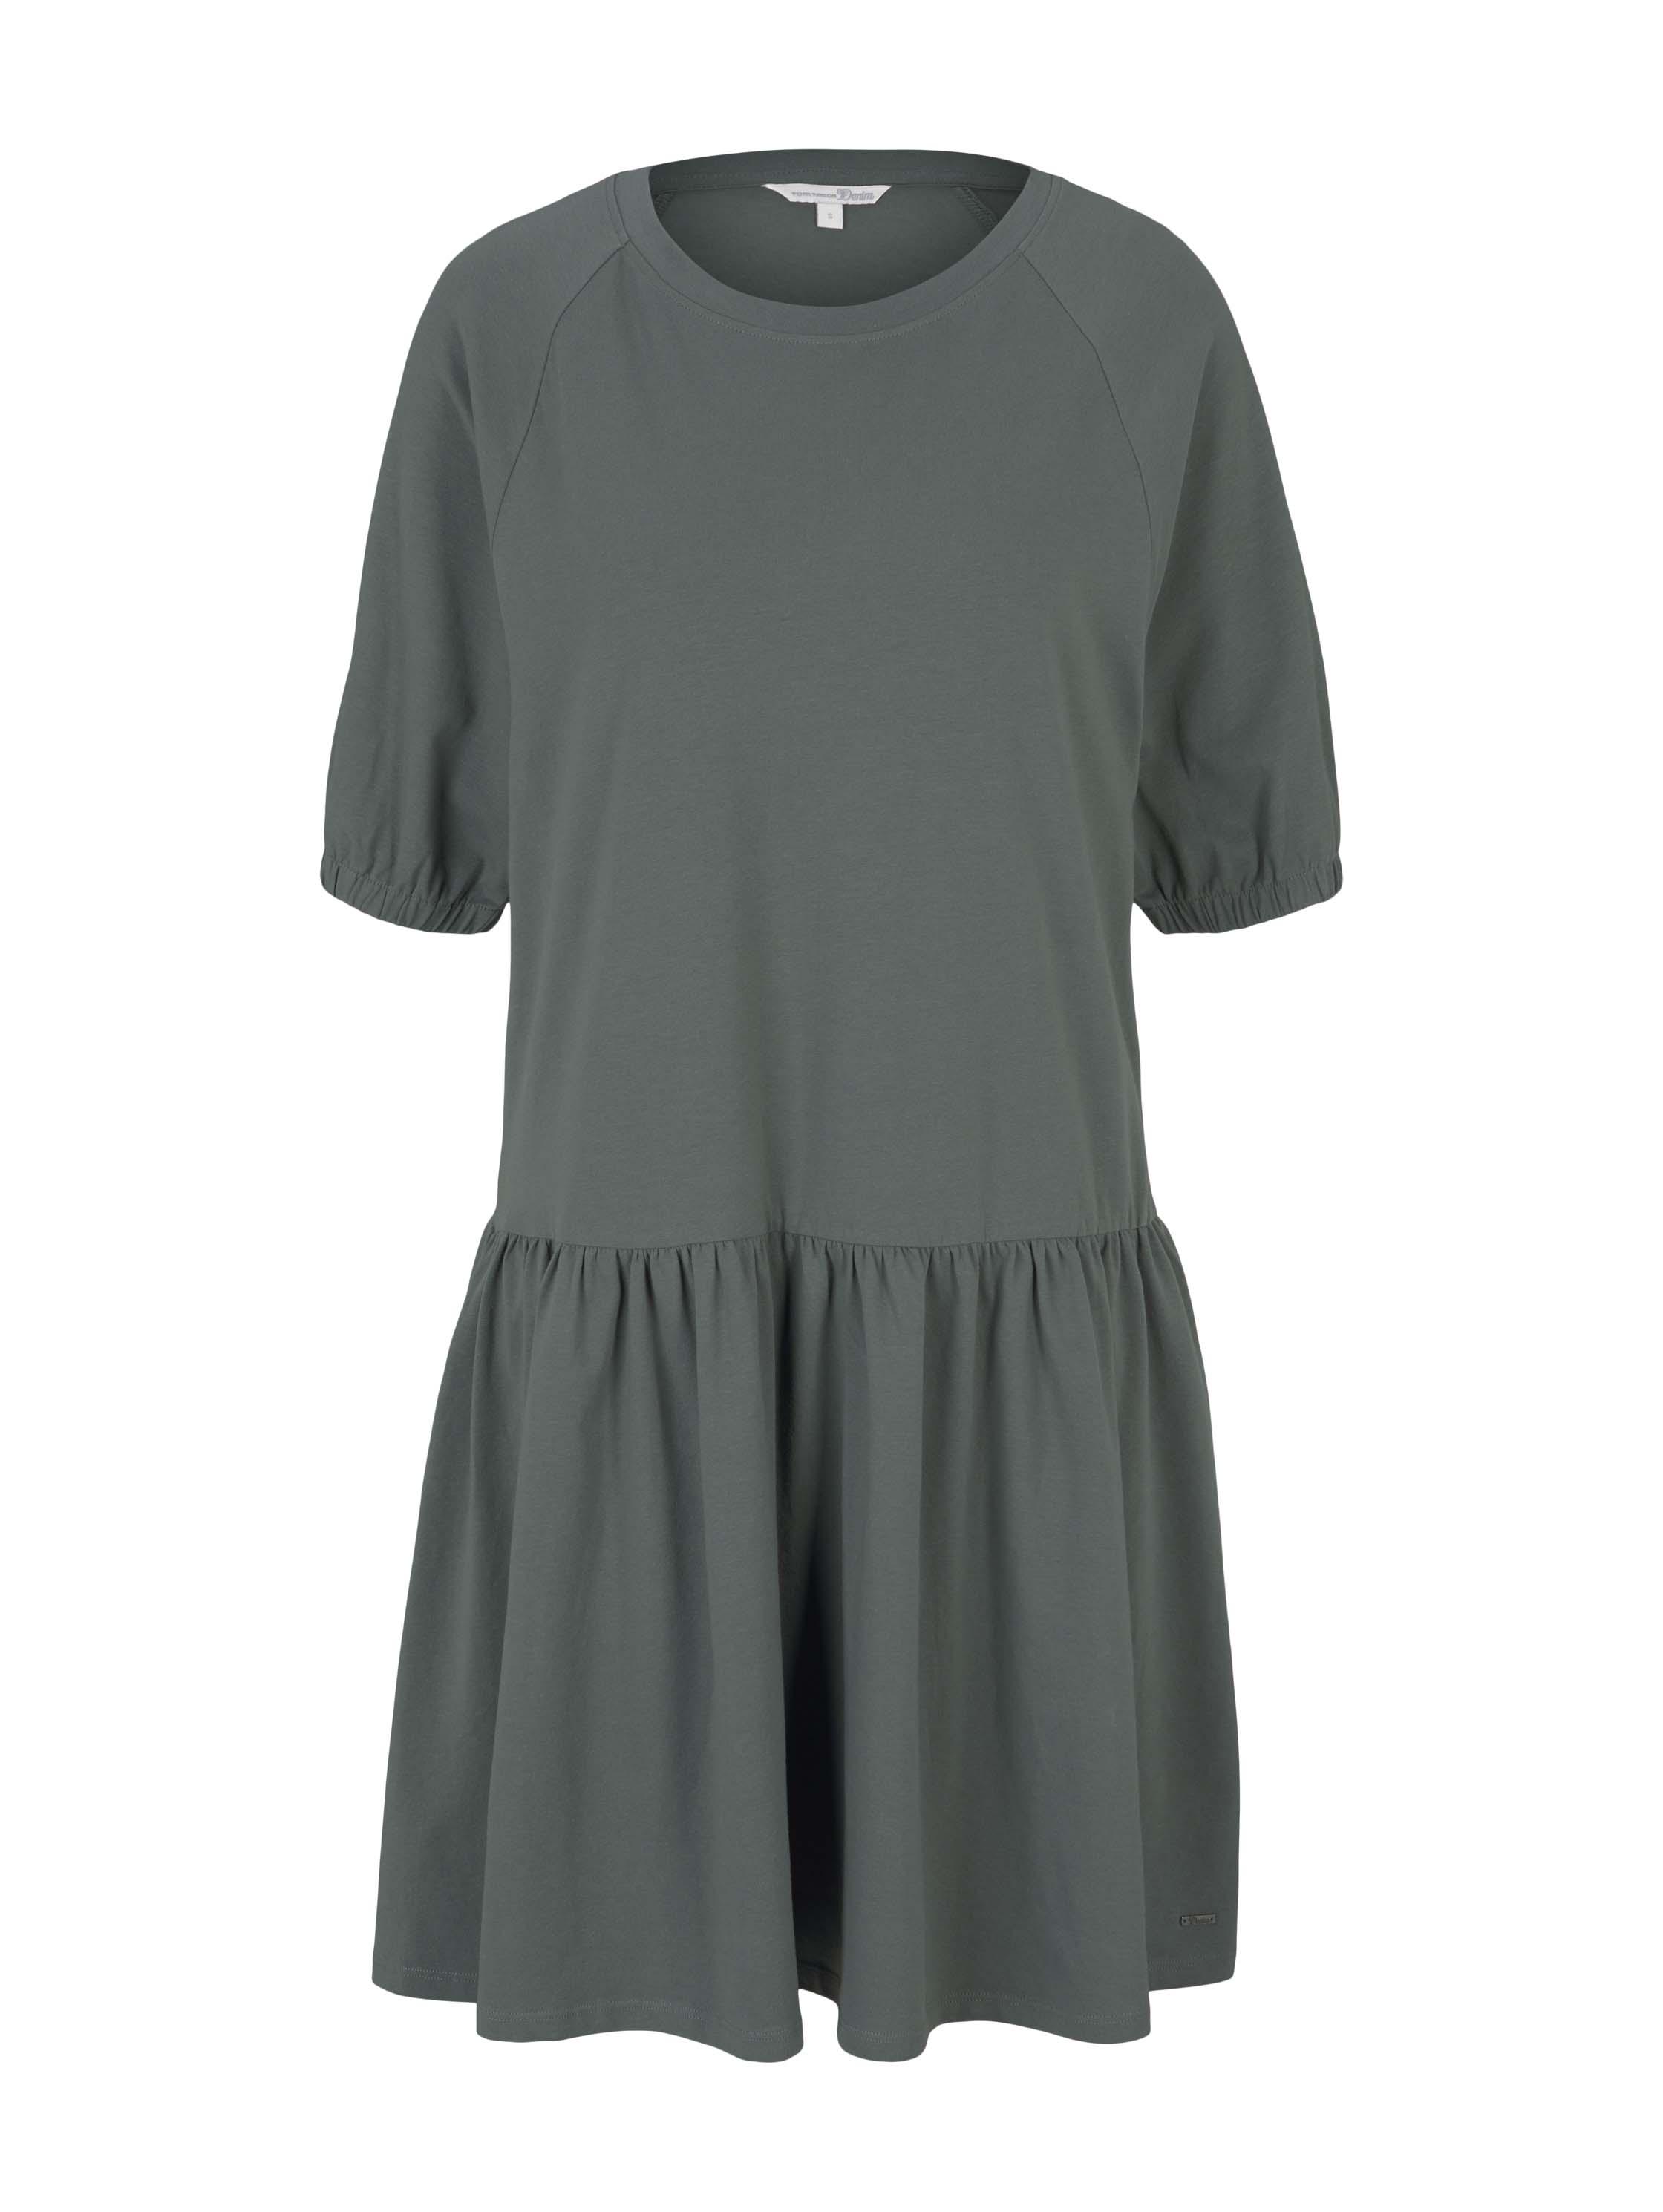 balloon sleeve jersey dress, dusty pine green